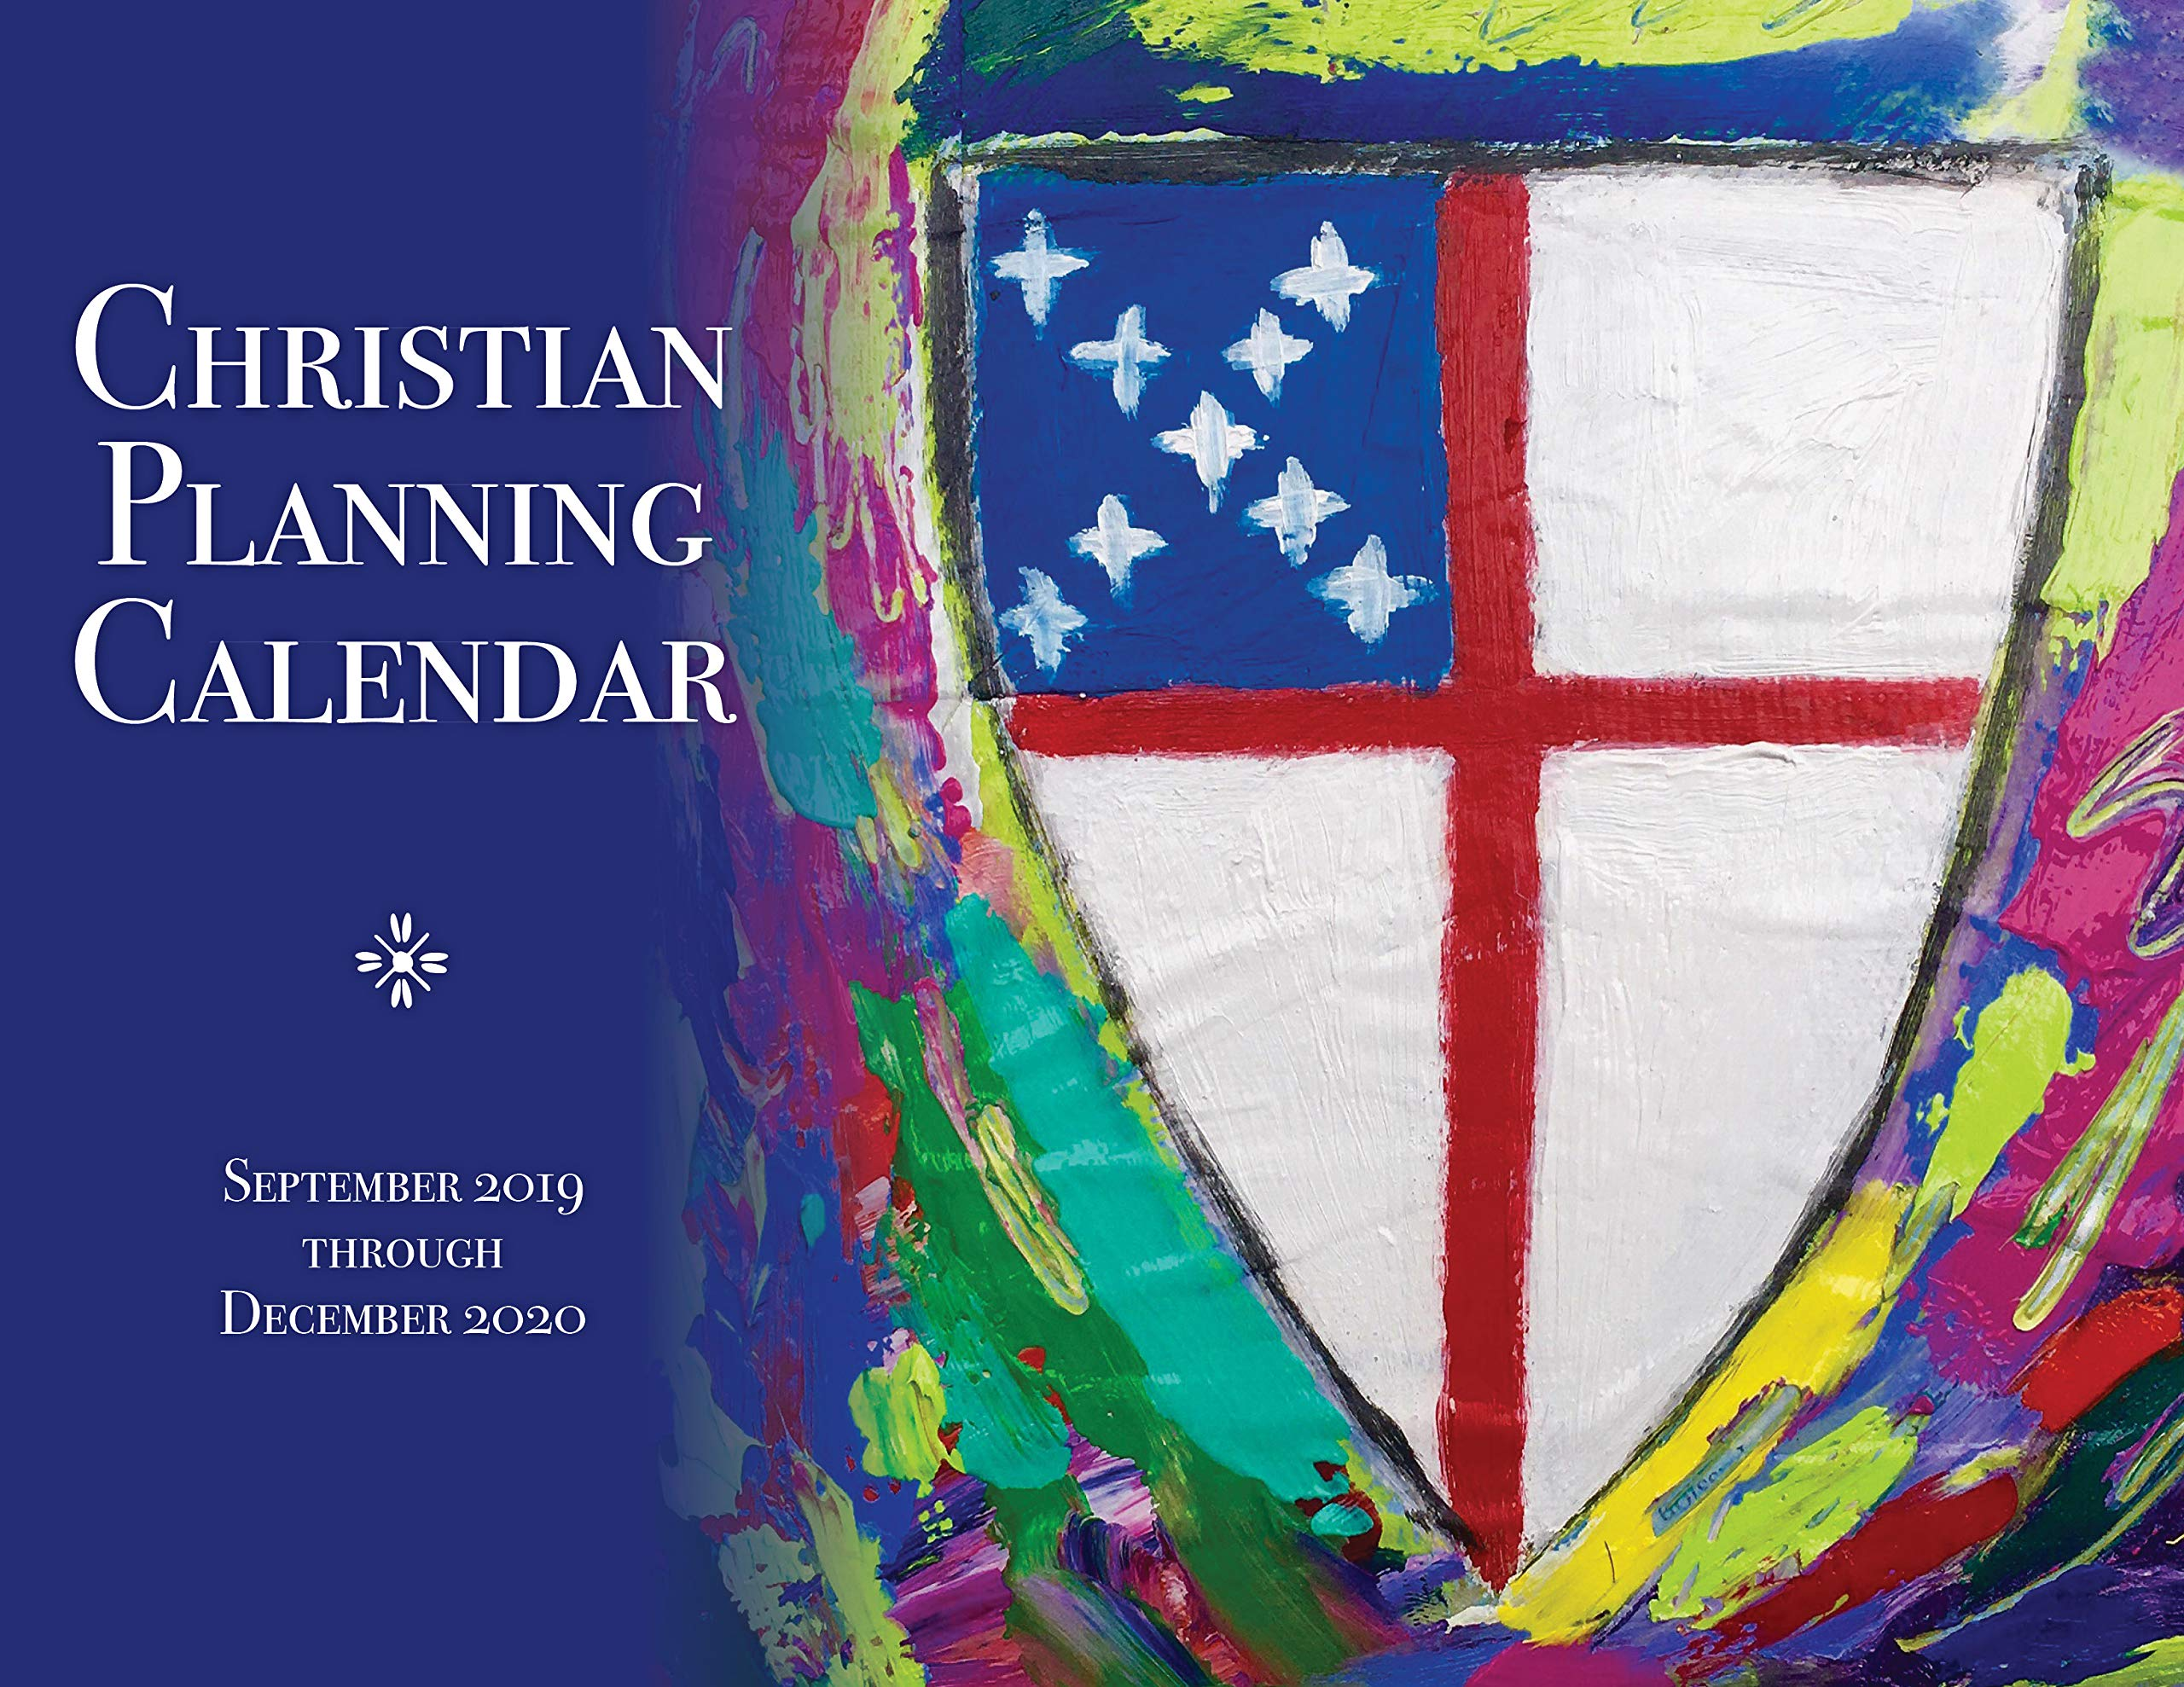 Calendar 2020 September December Dates Christian Planning Calendar 2019 2020: September 2019 through